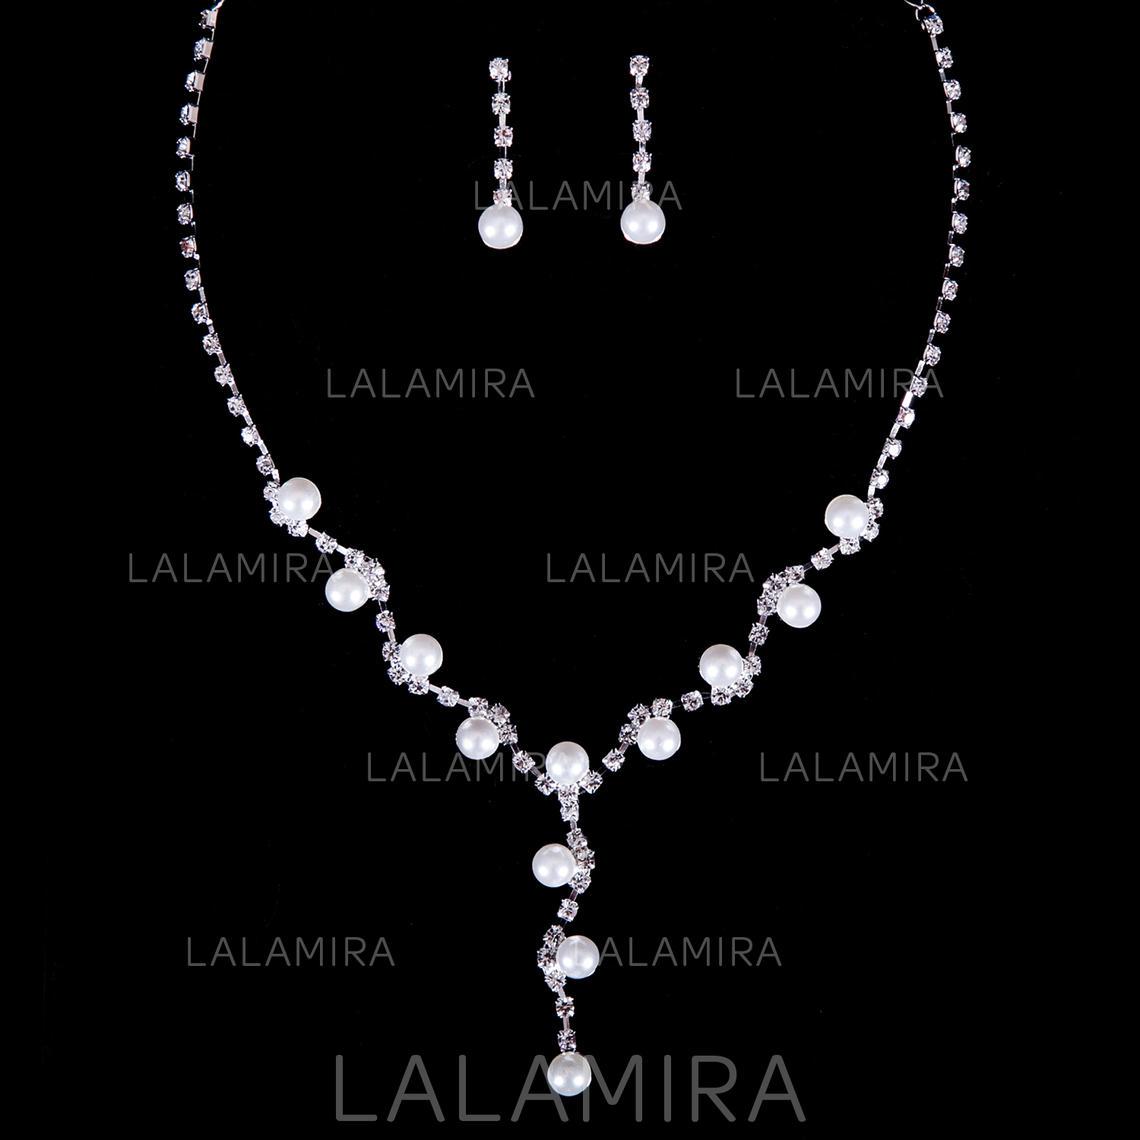 60e9fcdaae49 Sistemas de la joyería Diamantes de imitación Perla Corchete de la langosta  Perforado Joyas de boda. Loading zoom. Cargando